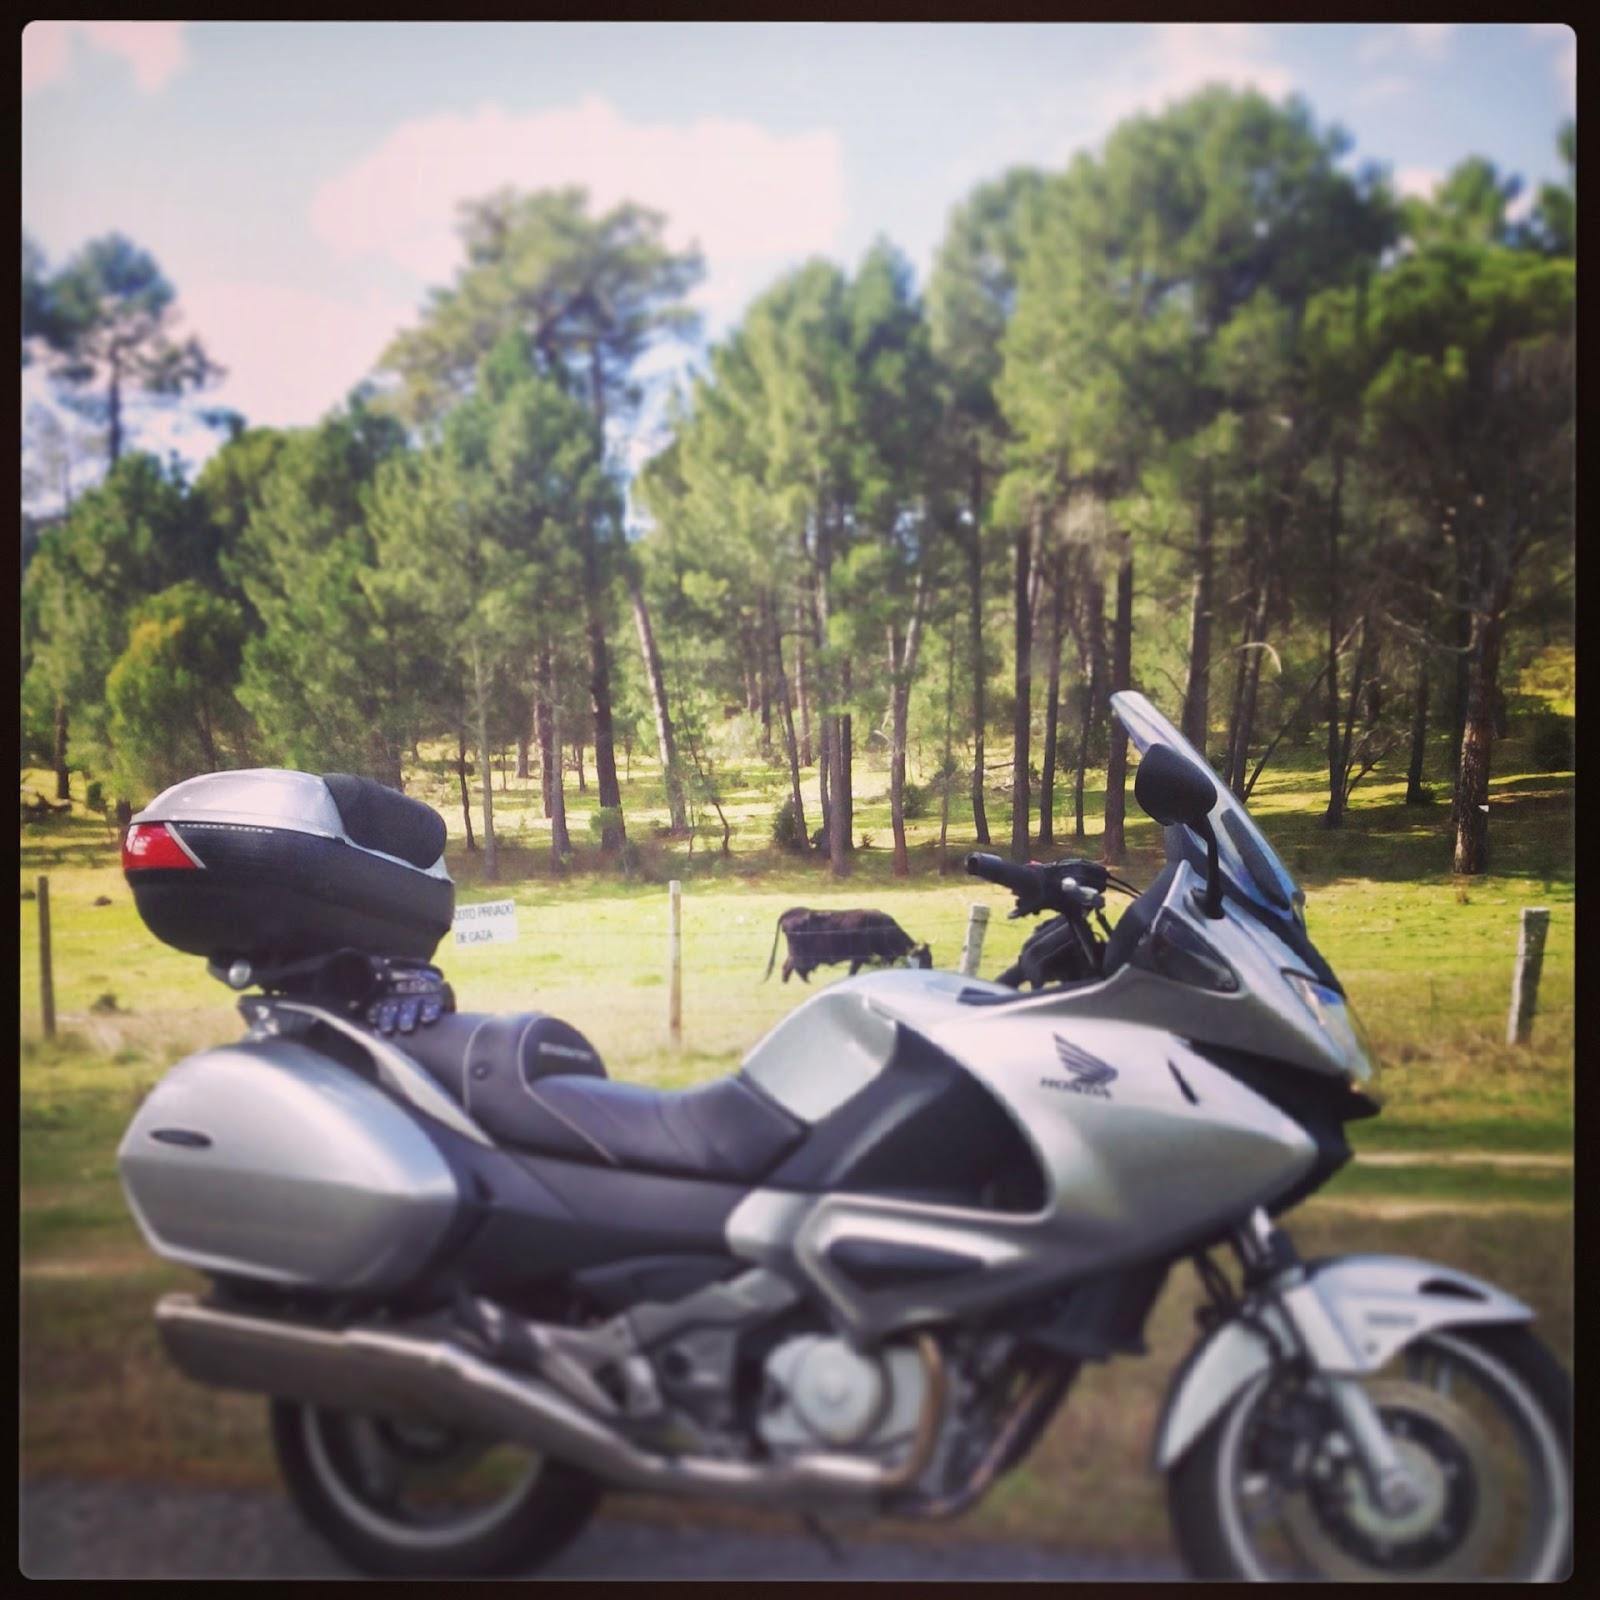 RUTA EN MOTO DE 103 Km HOYOS DE PINARES